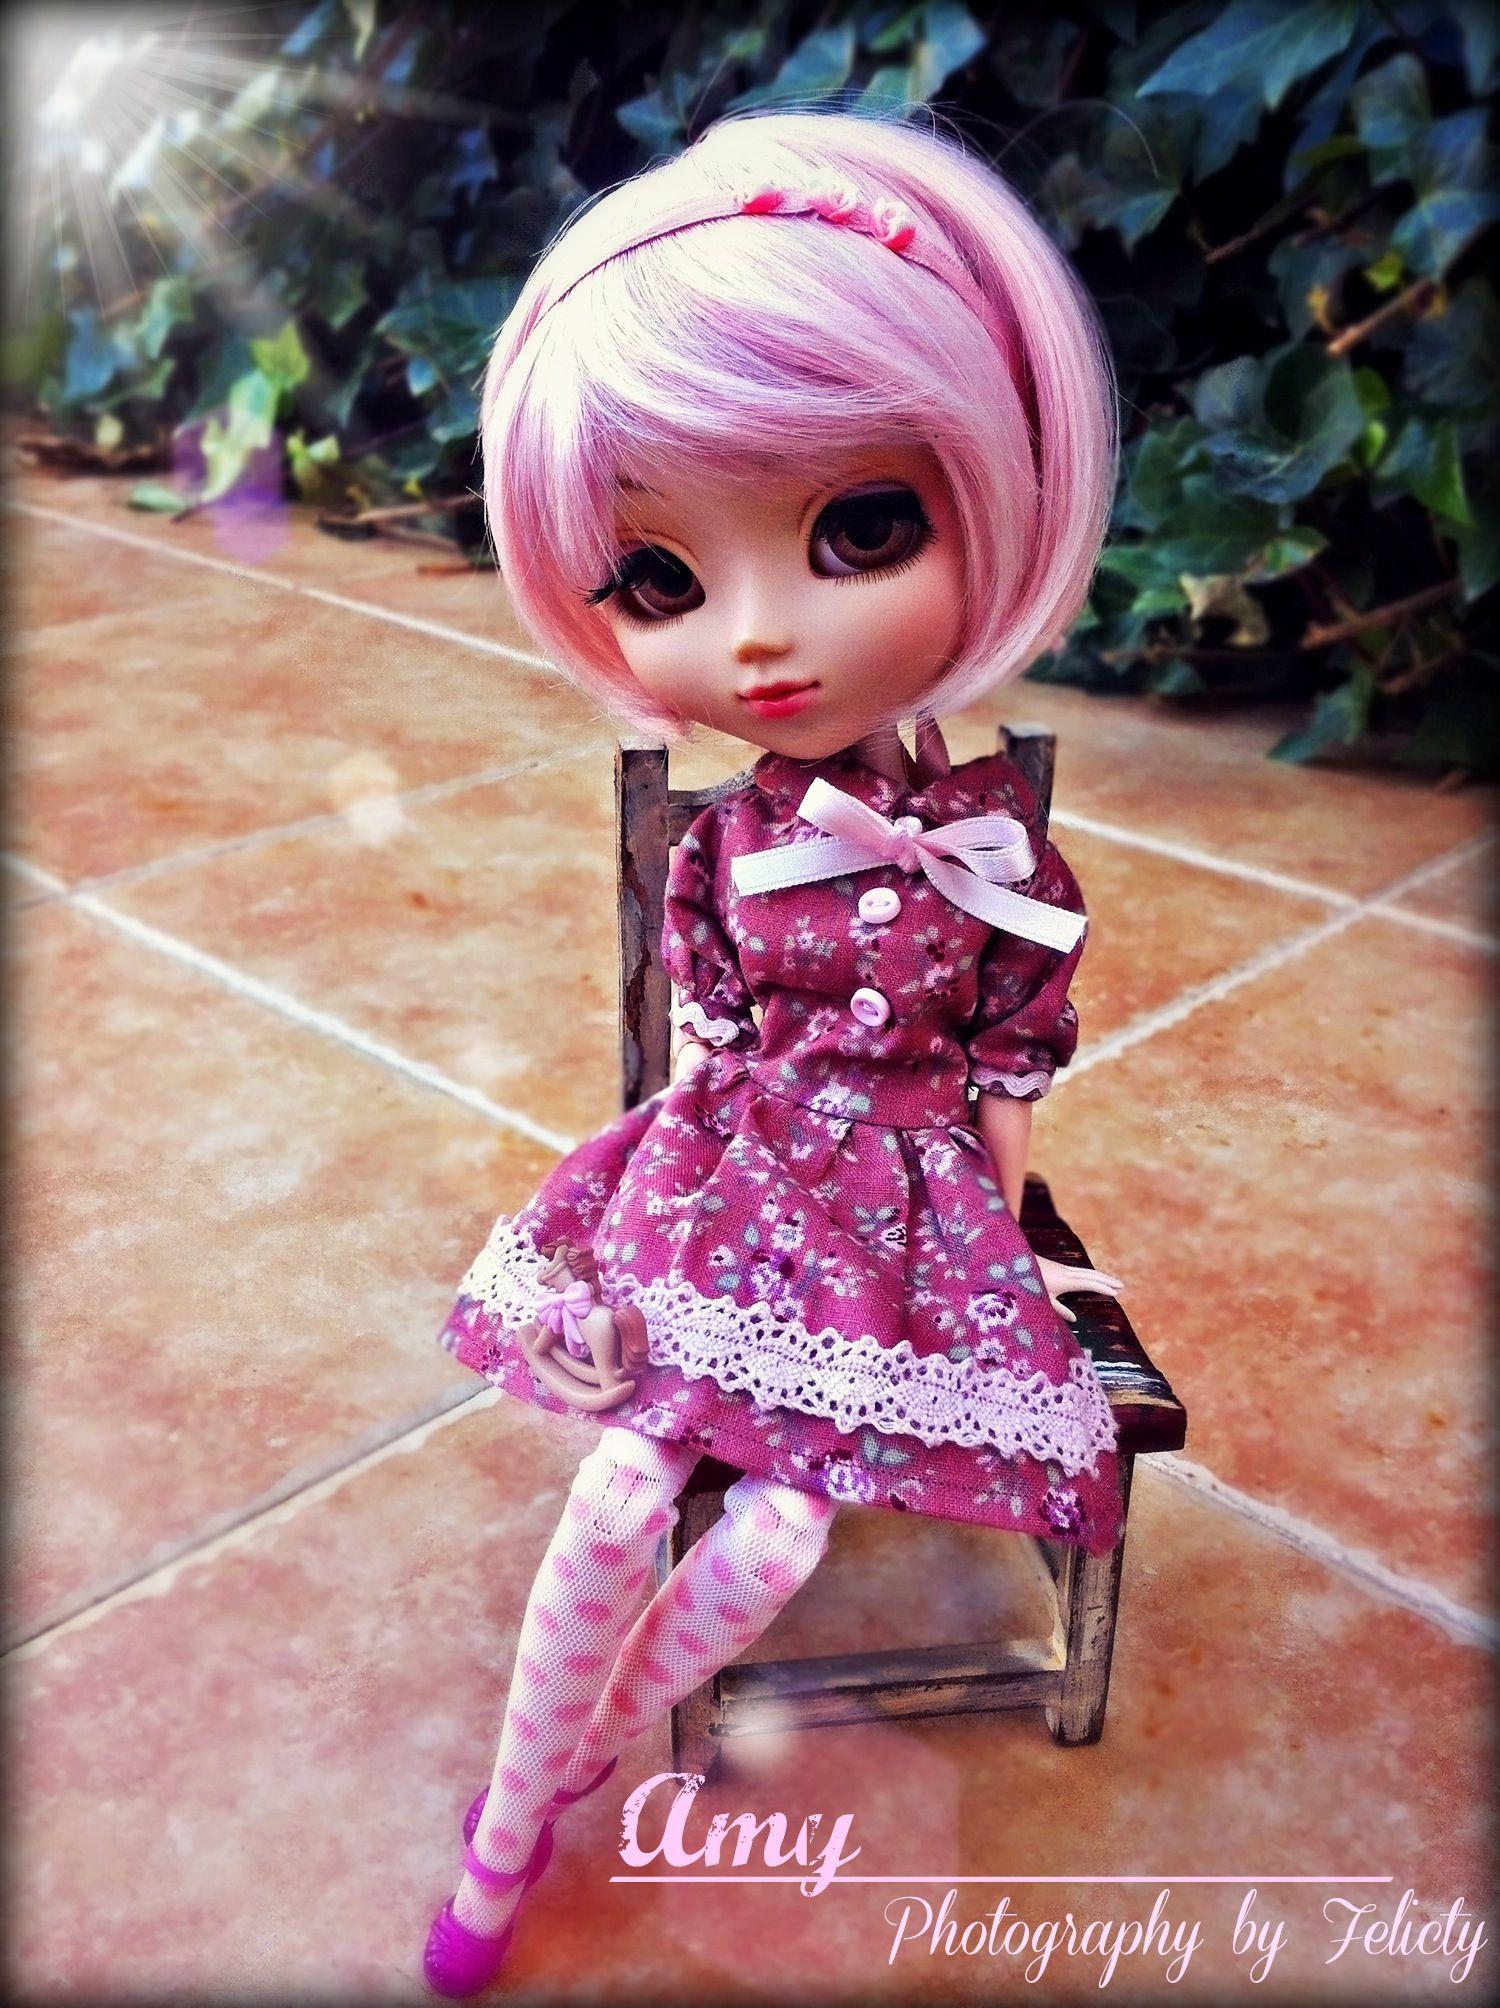 Amy (Pullip Papin) - My first handmade dress